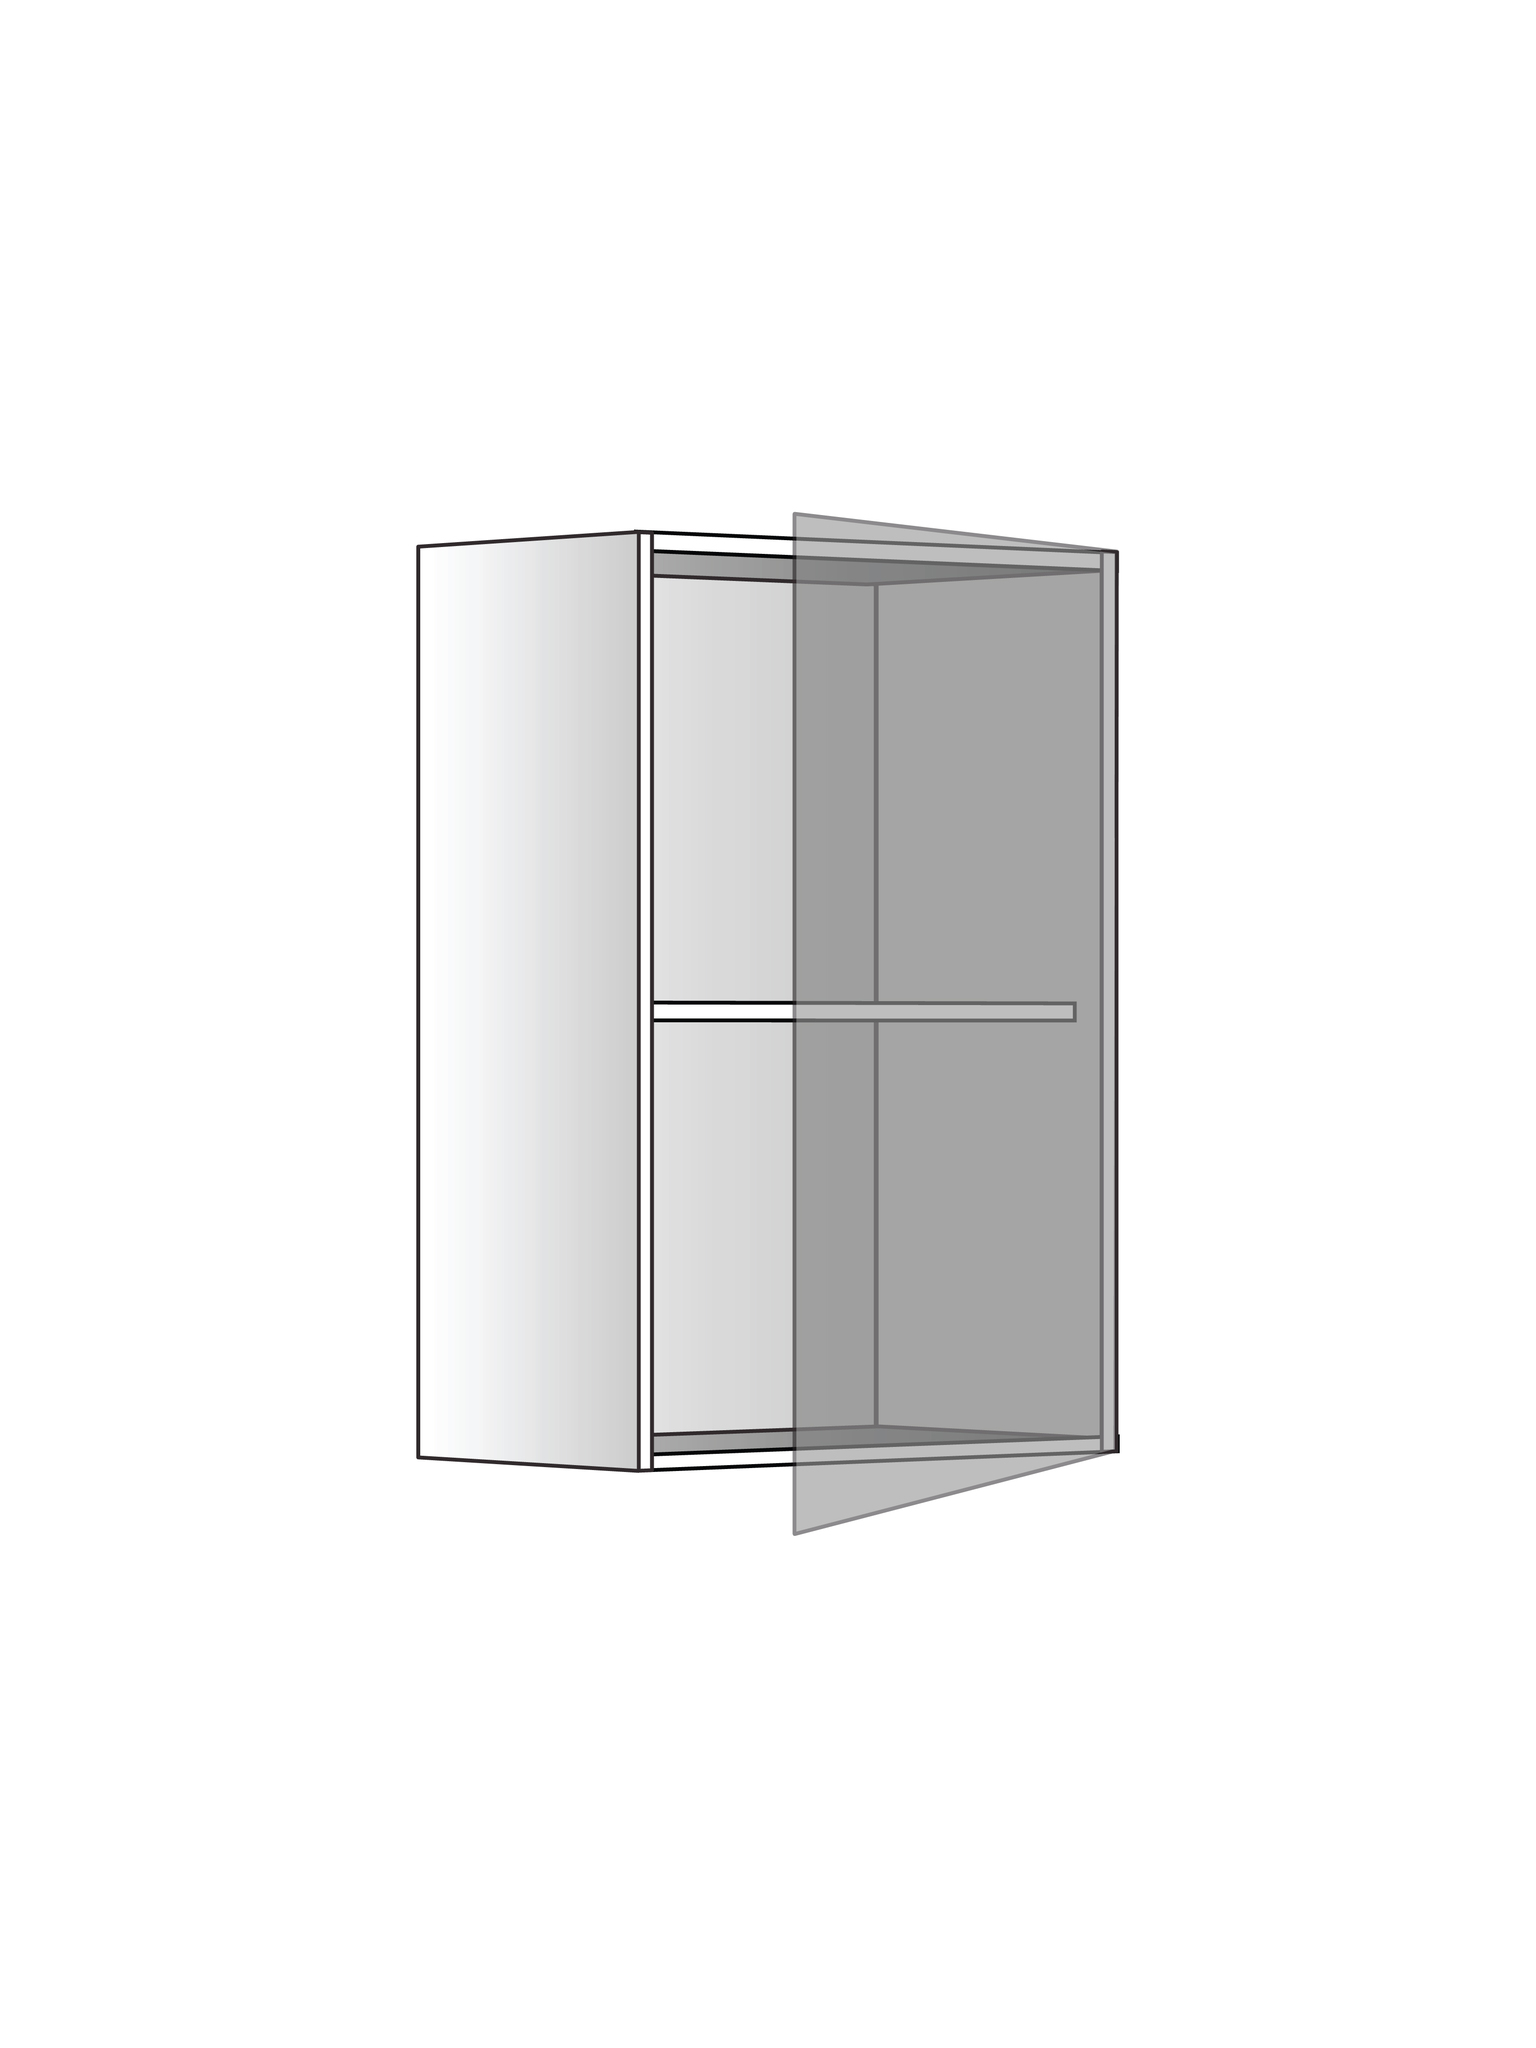 Верхний шкаф c одной полкой, 720Х450 мм